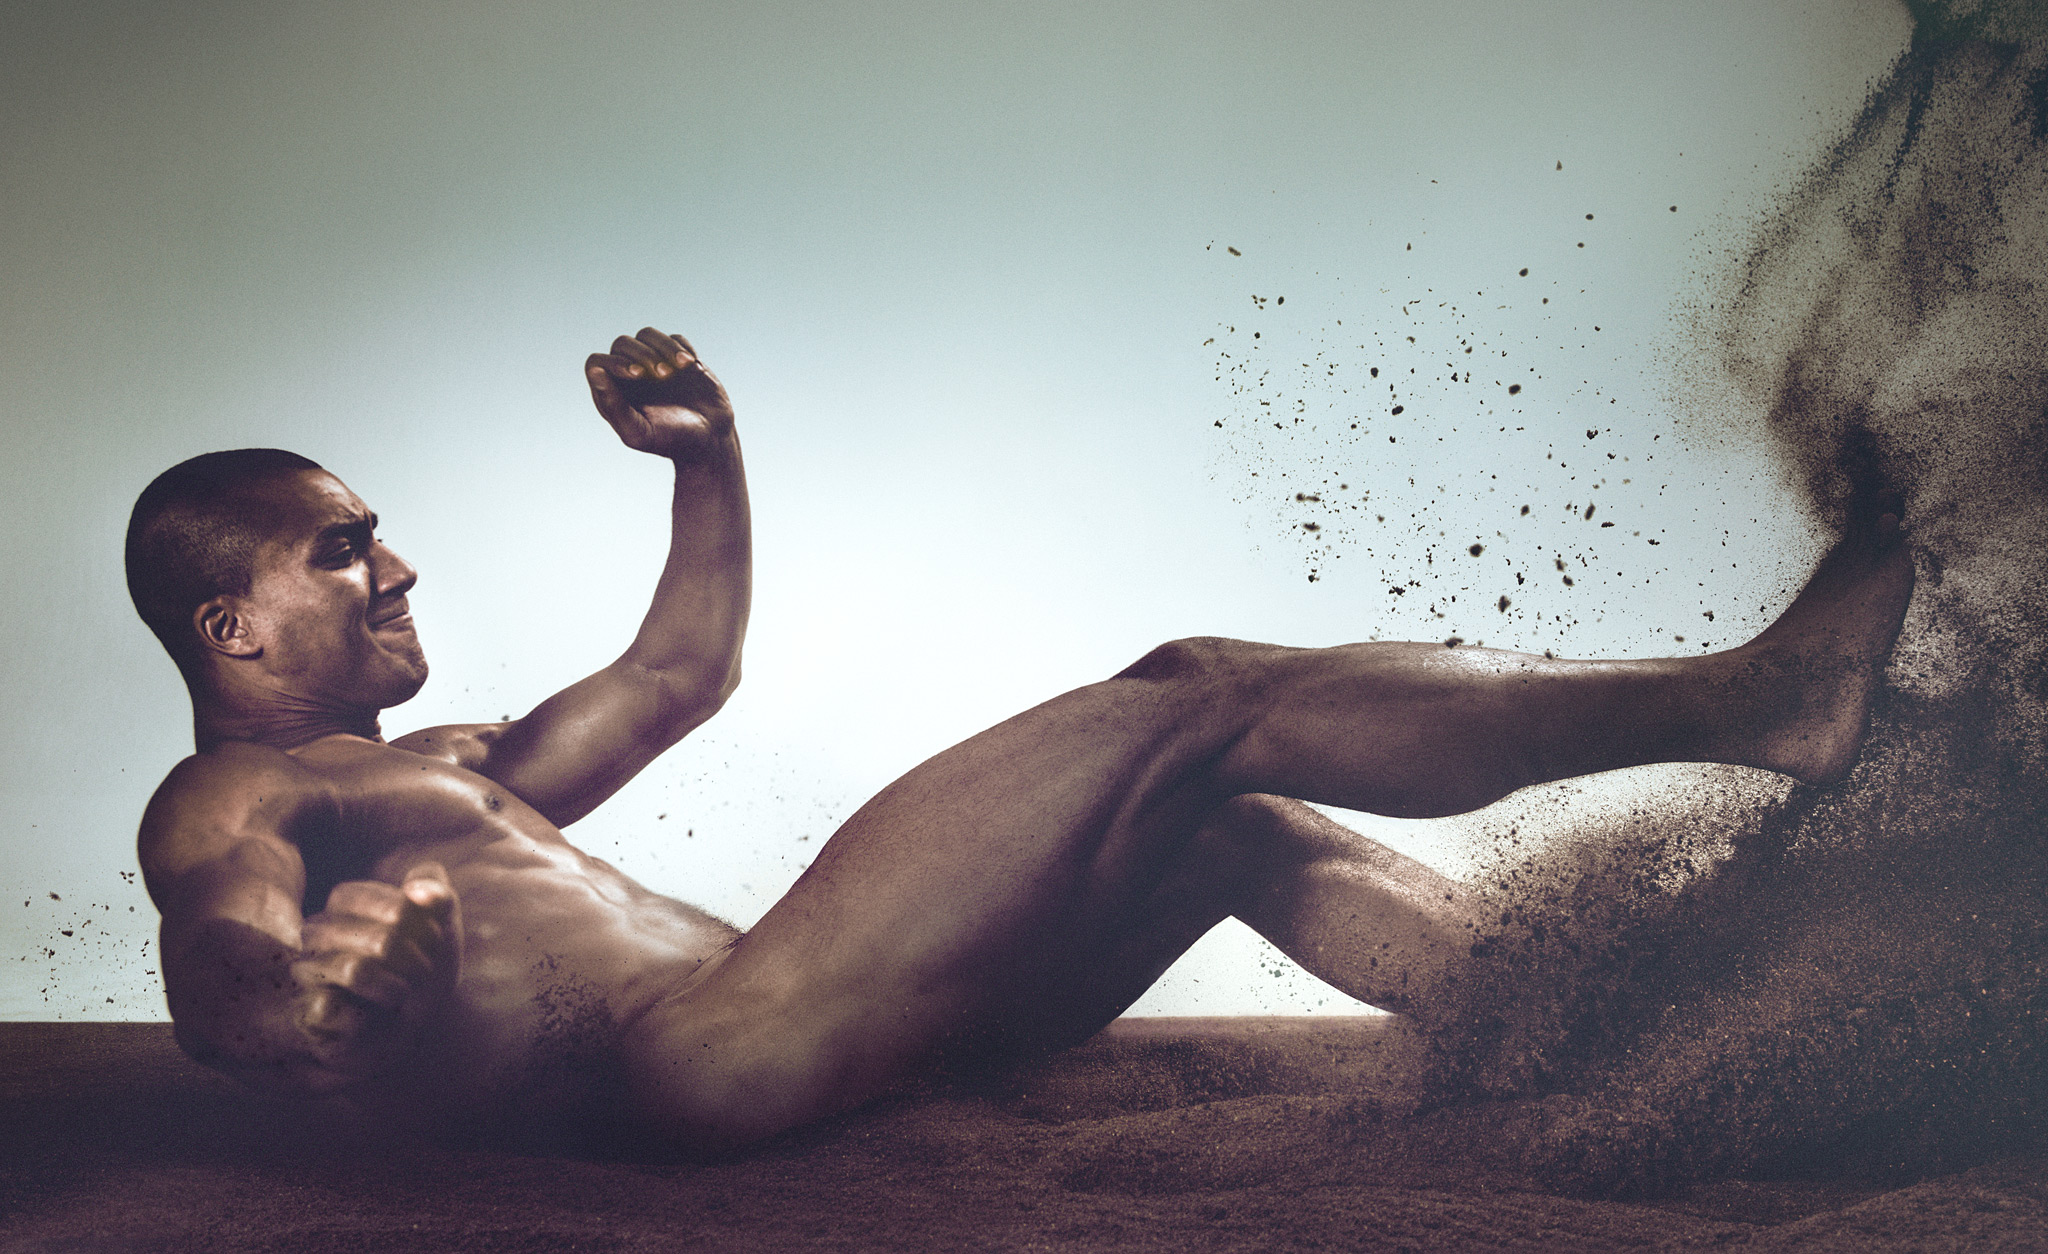 Espn Body Issue 2012 Gallery photo 23